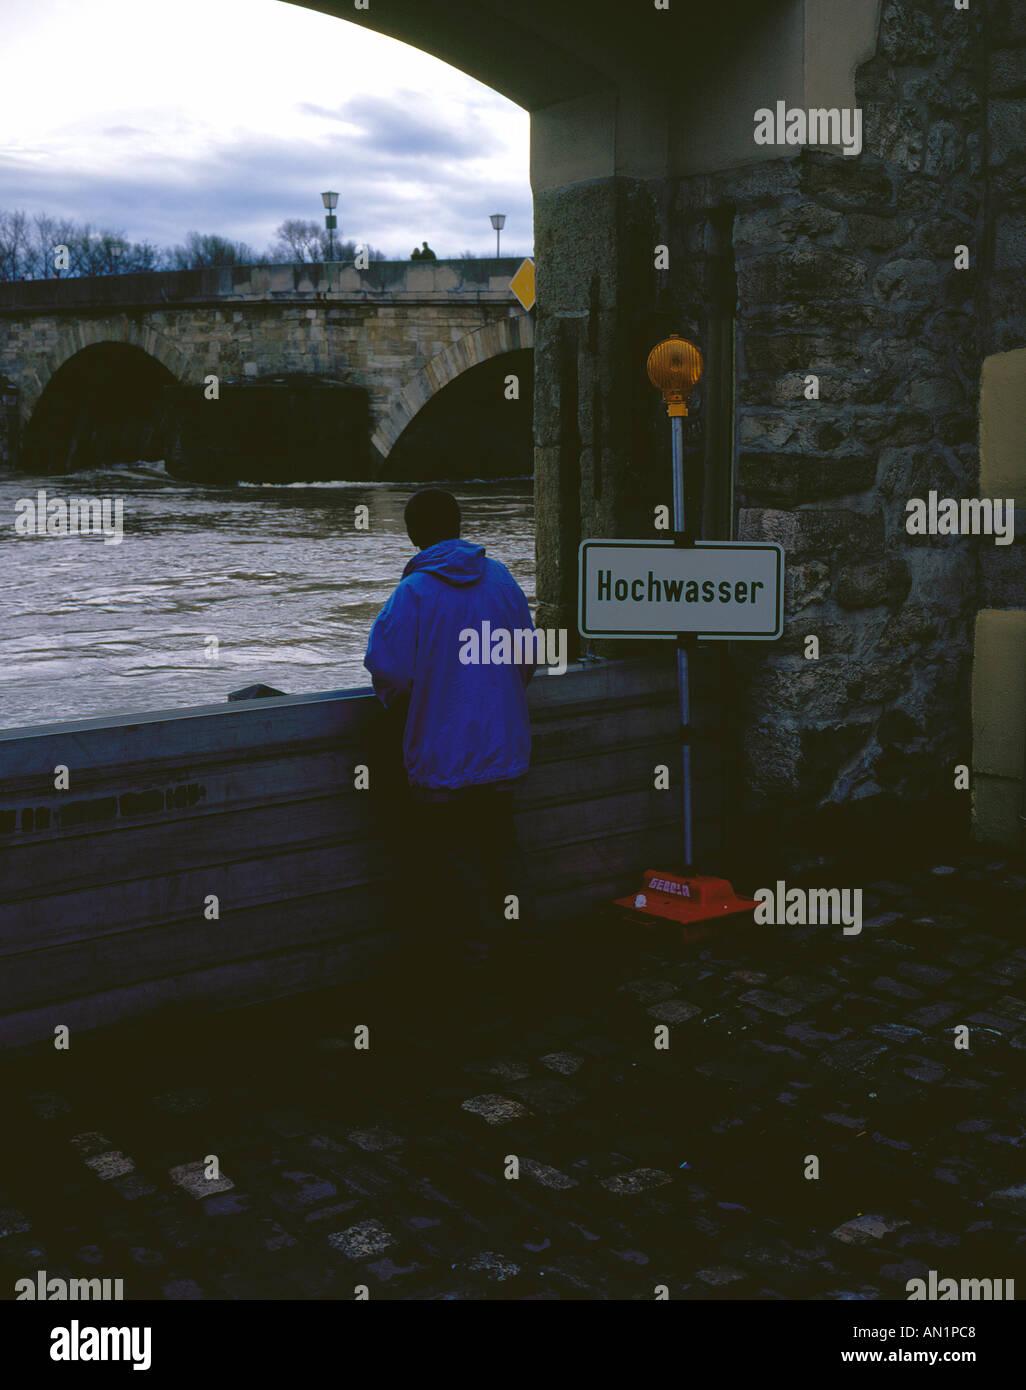 flood of Danube in Regensburg Bavaria Germany Europe. Photo by Willy Matheisl - Stock Image